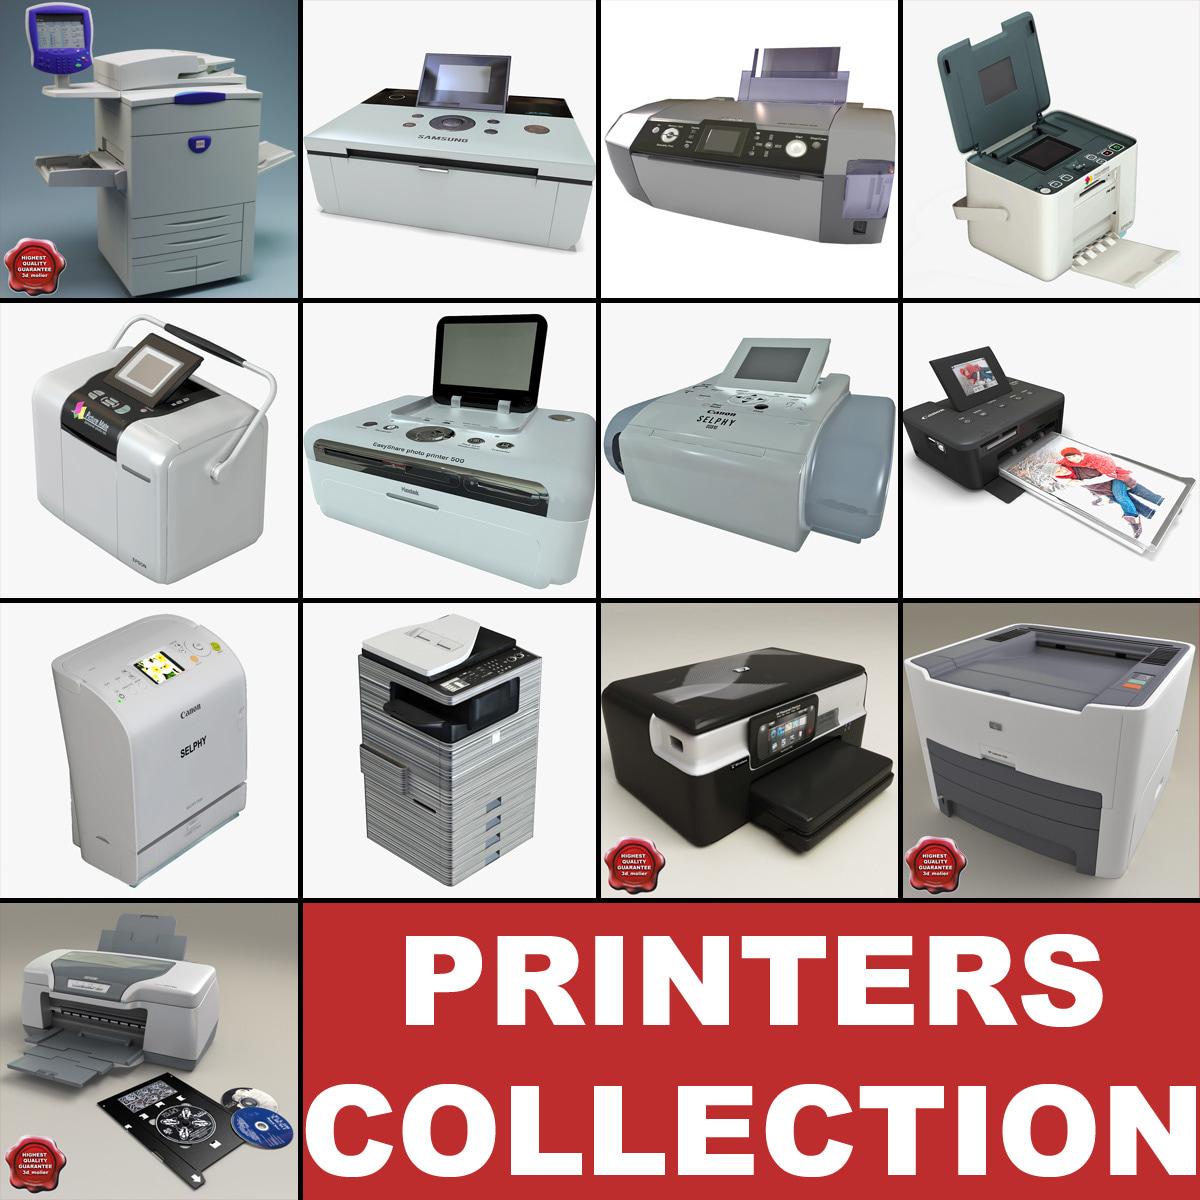 Printers_Collection_V6_000.jpg